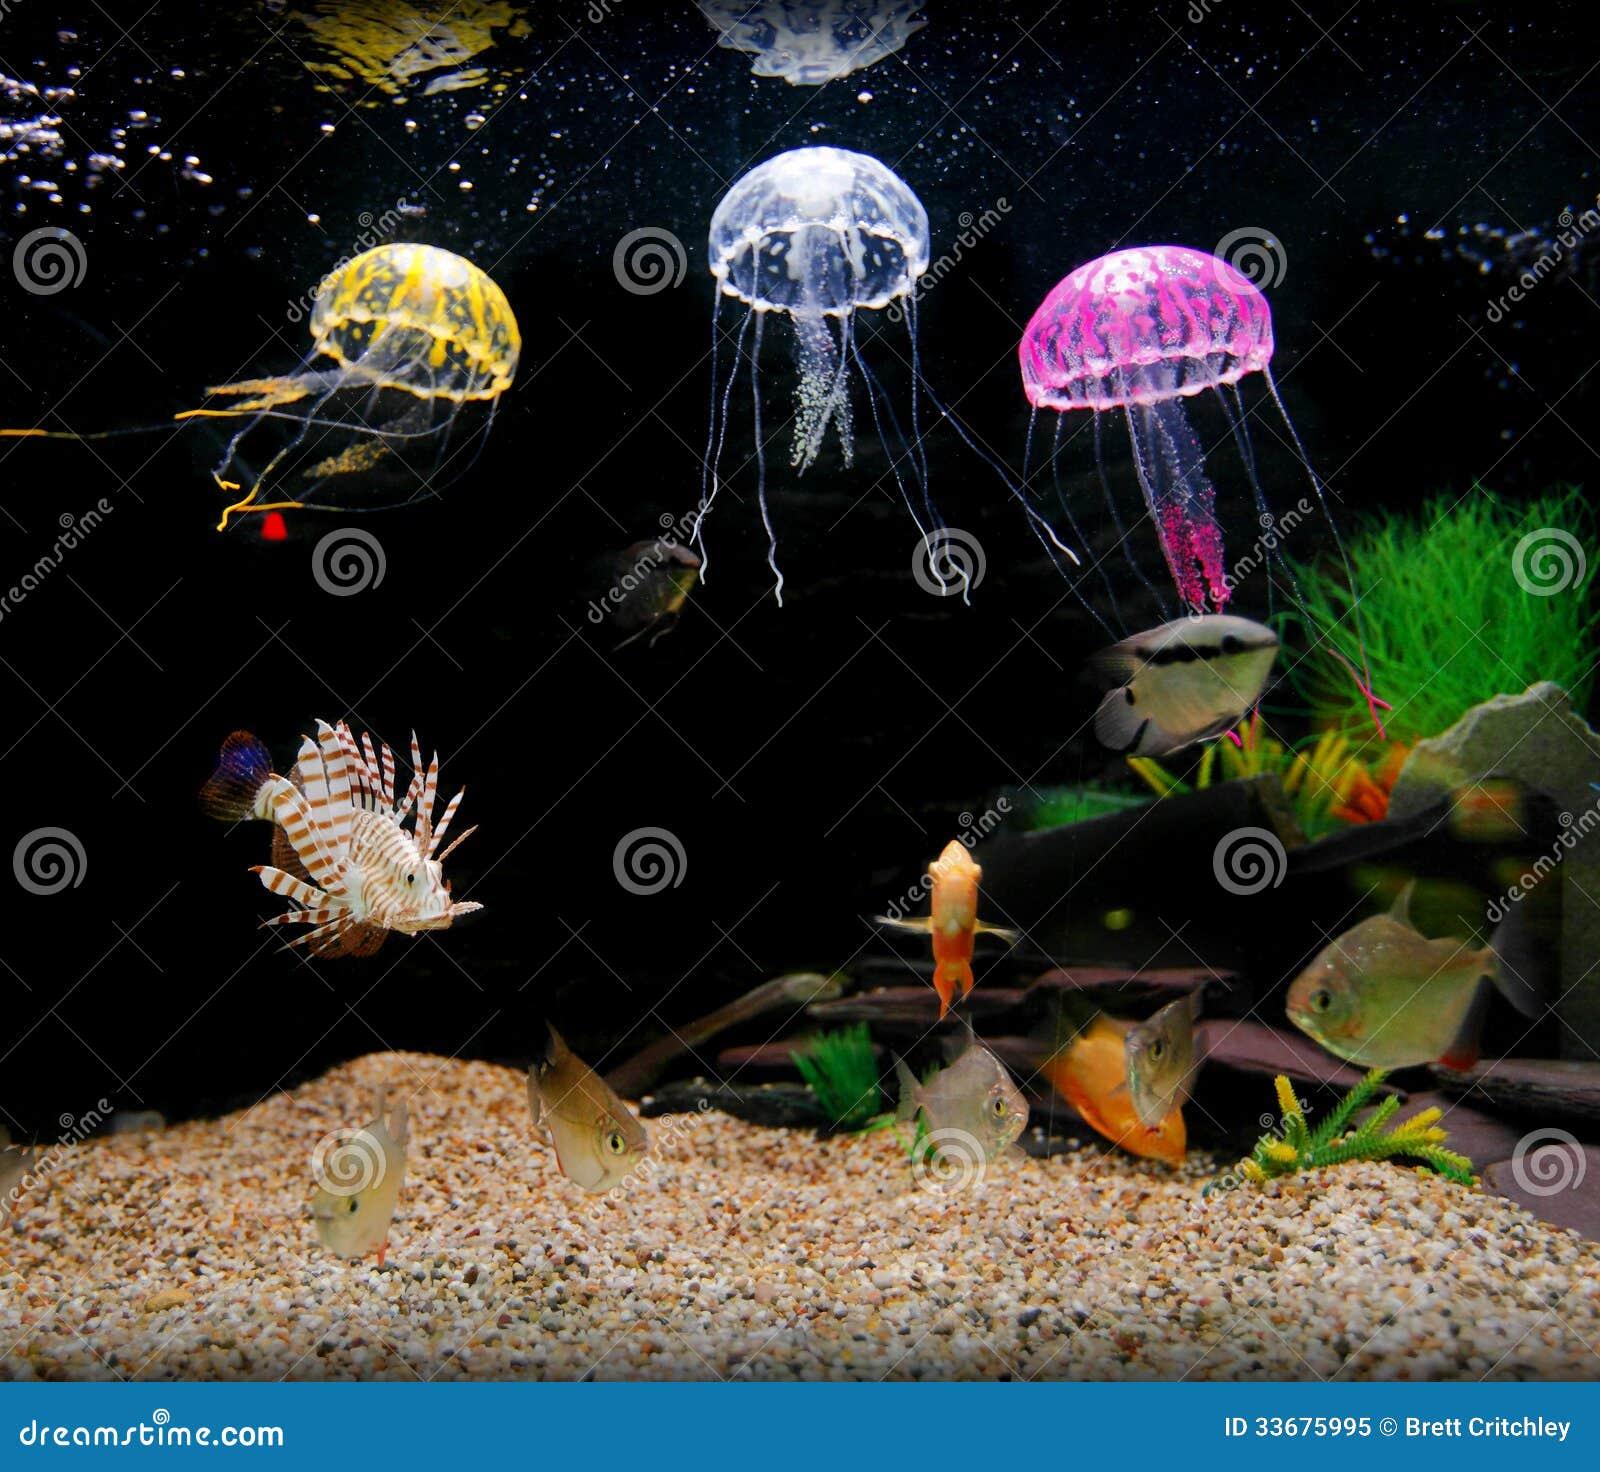 Fish aquarium for home - Home Aquarium Tank Royalty Free Stock Photo